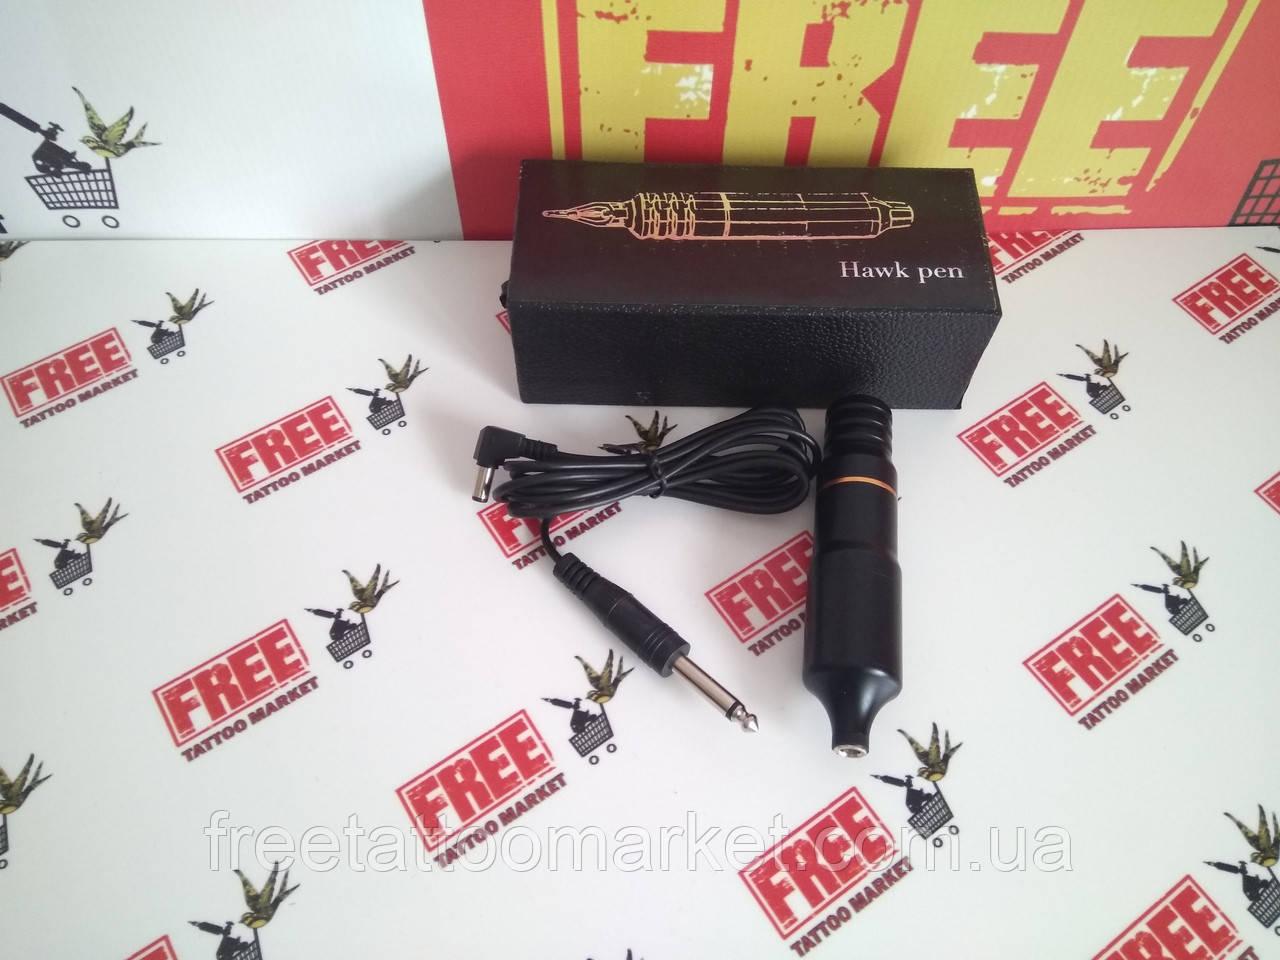 Тату машинка-ручка Cheyenne Hawk Pen (черная)